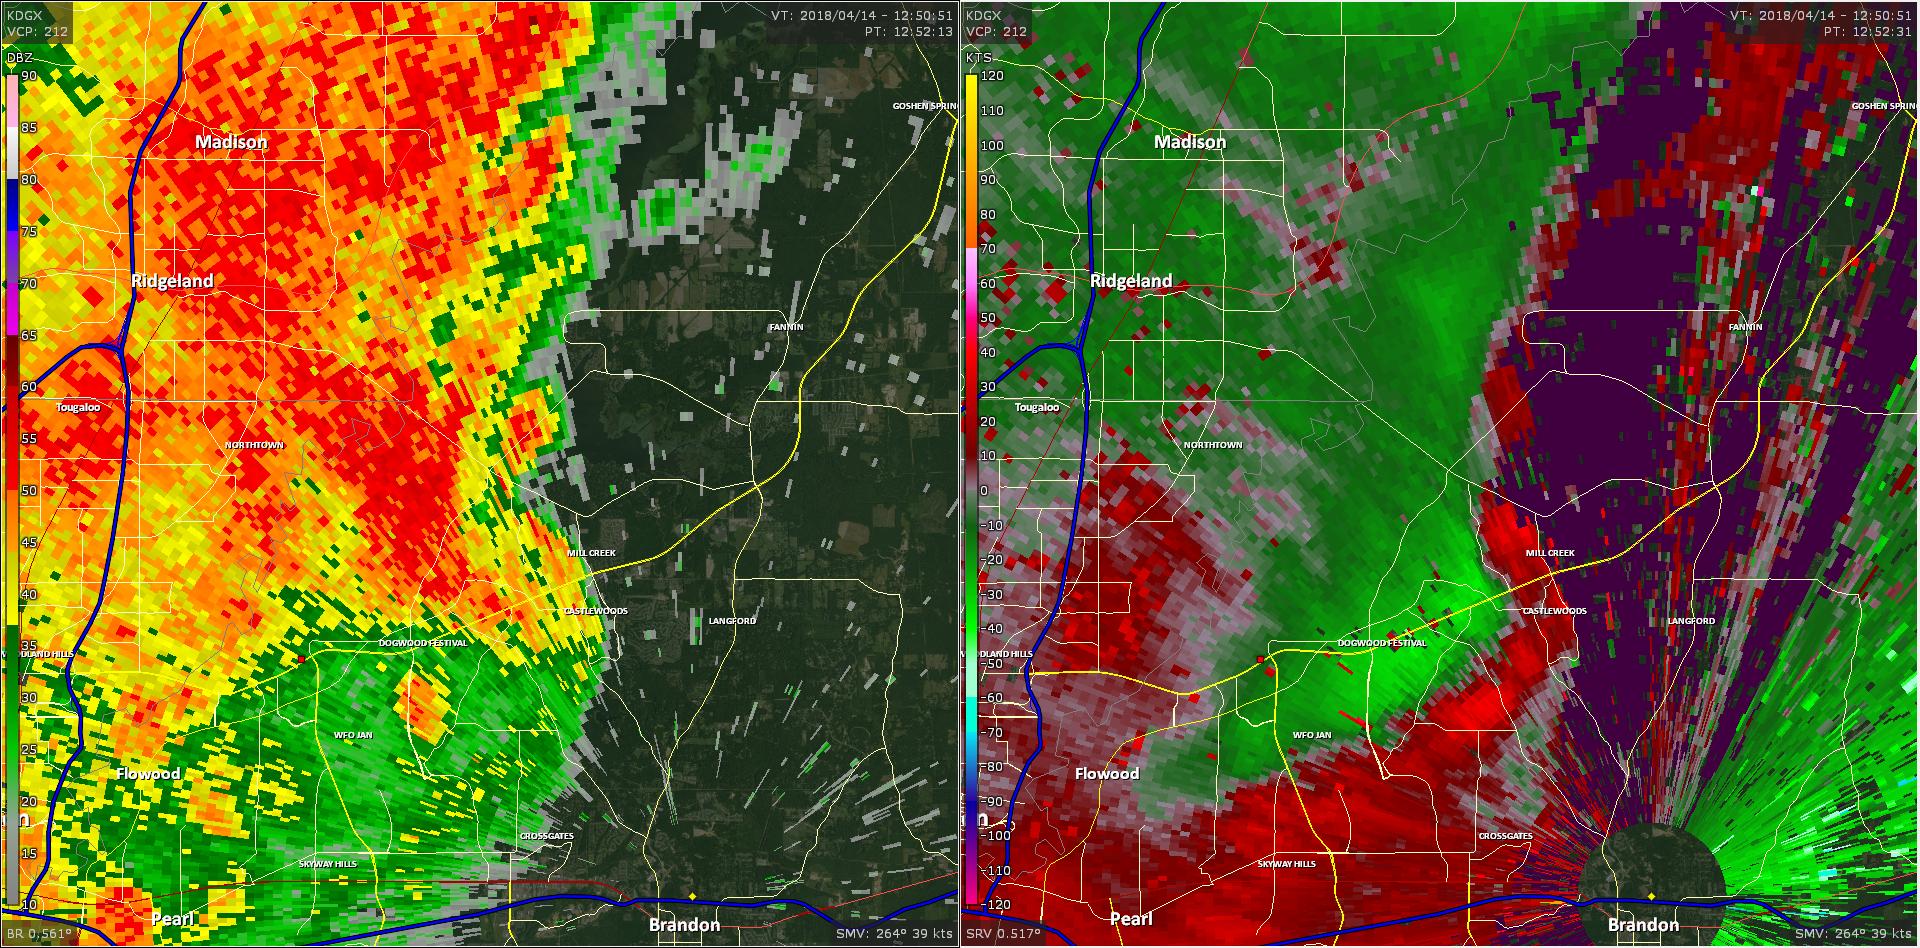 Radar - Flowood Tornado